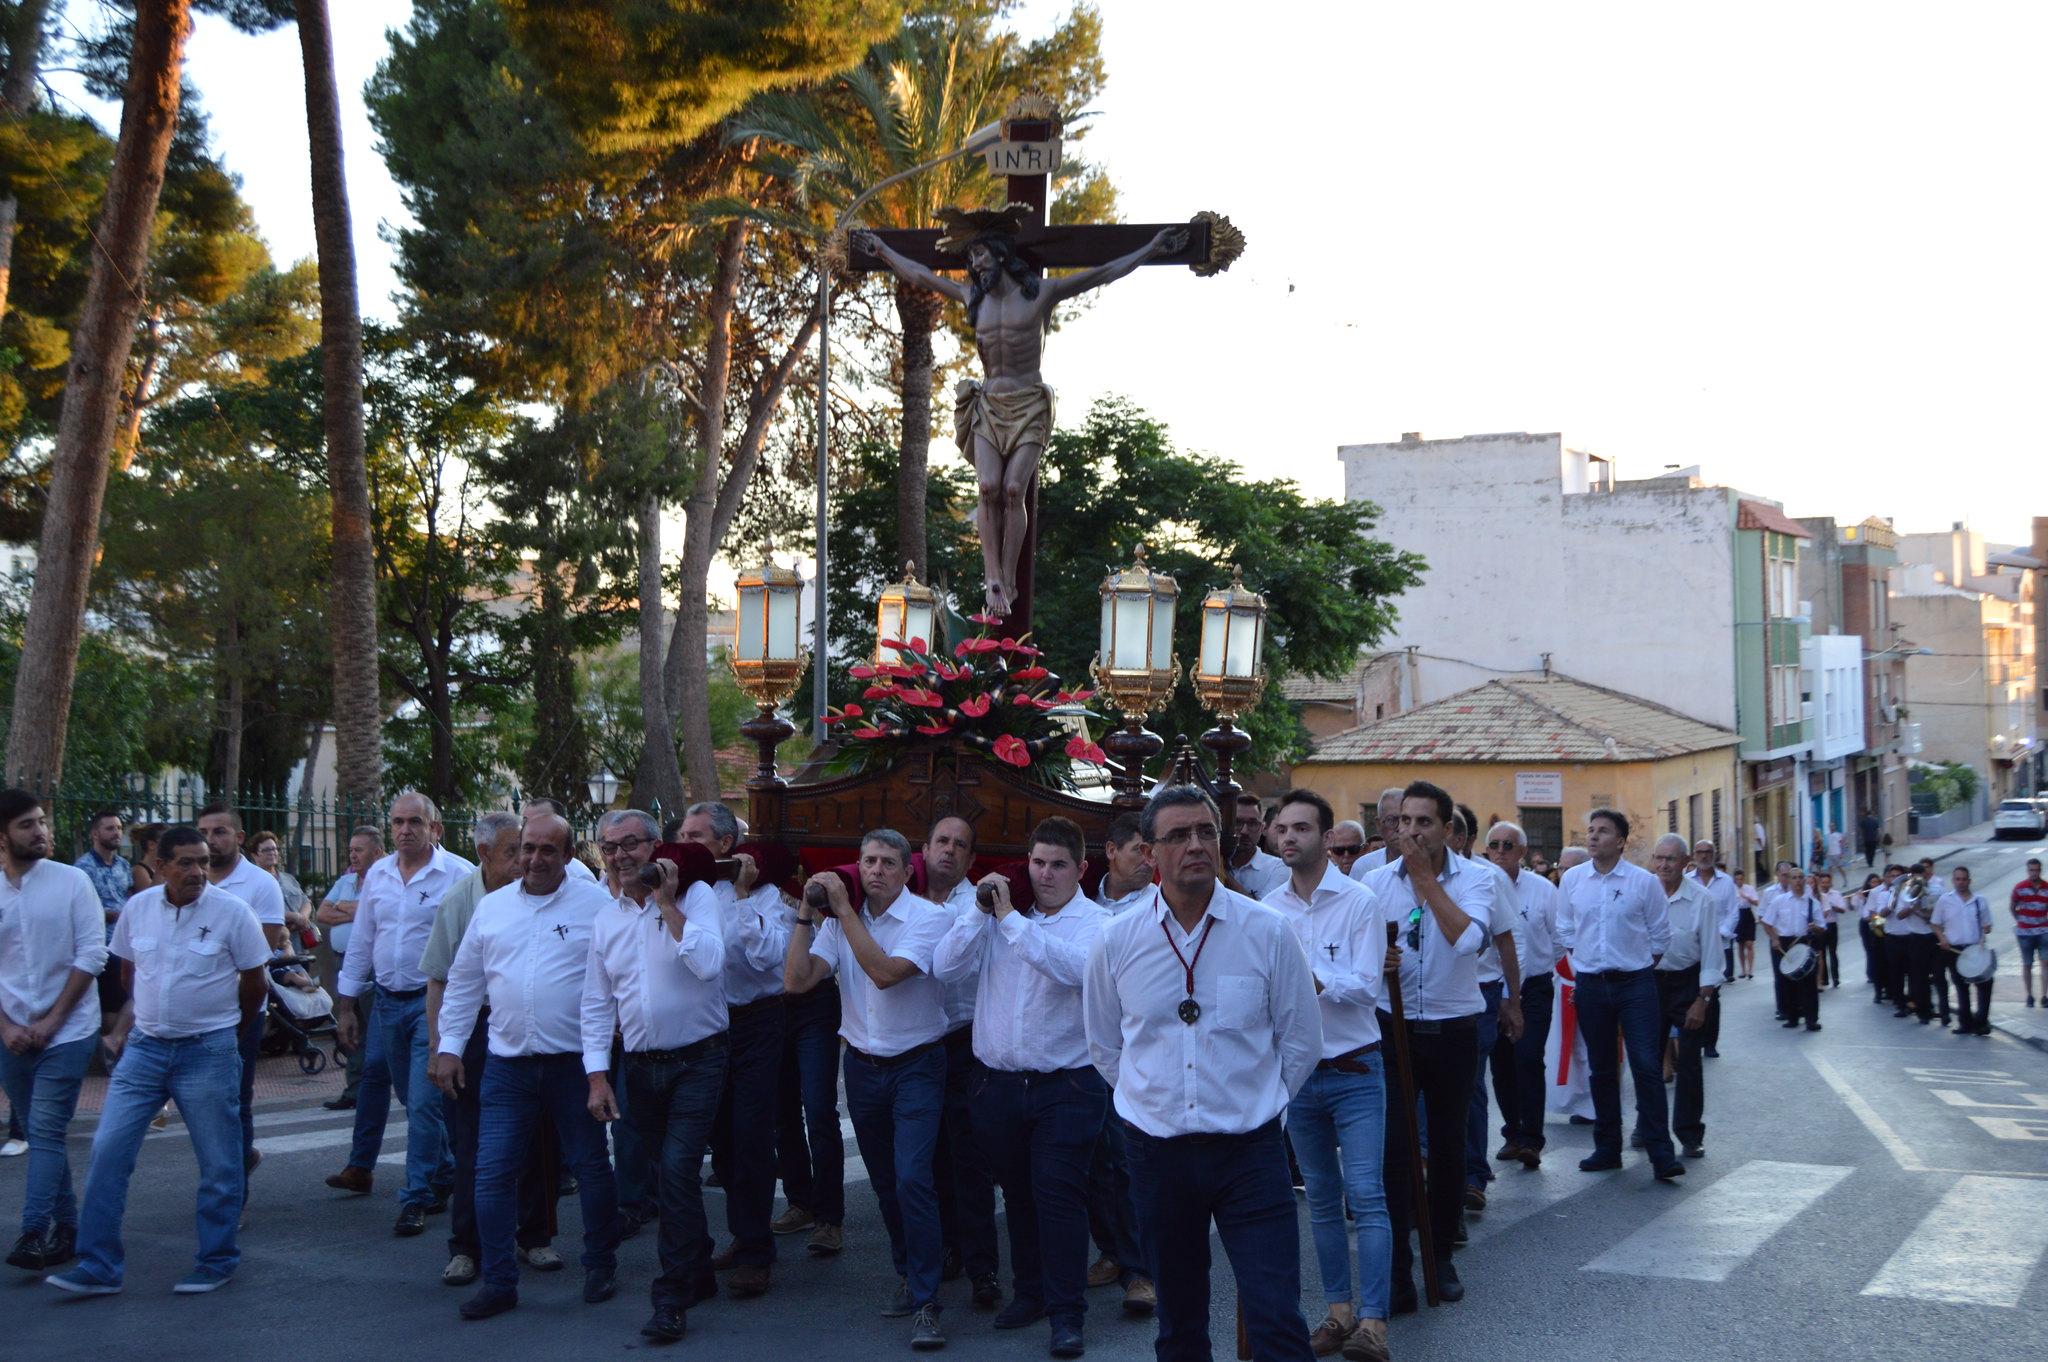 (2017-07-02) Procesión de subida (Adrián Romero Montesinos) (62)